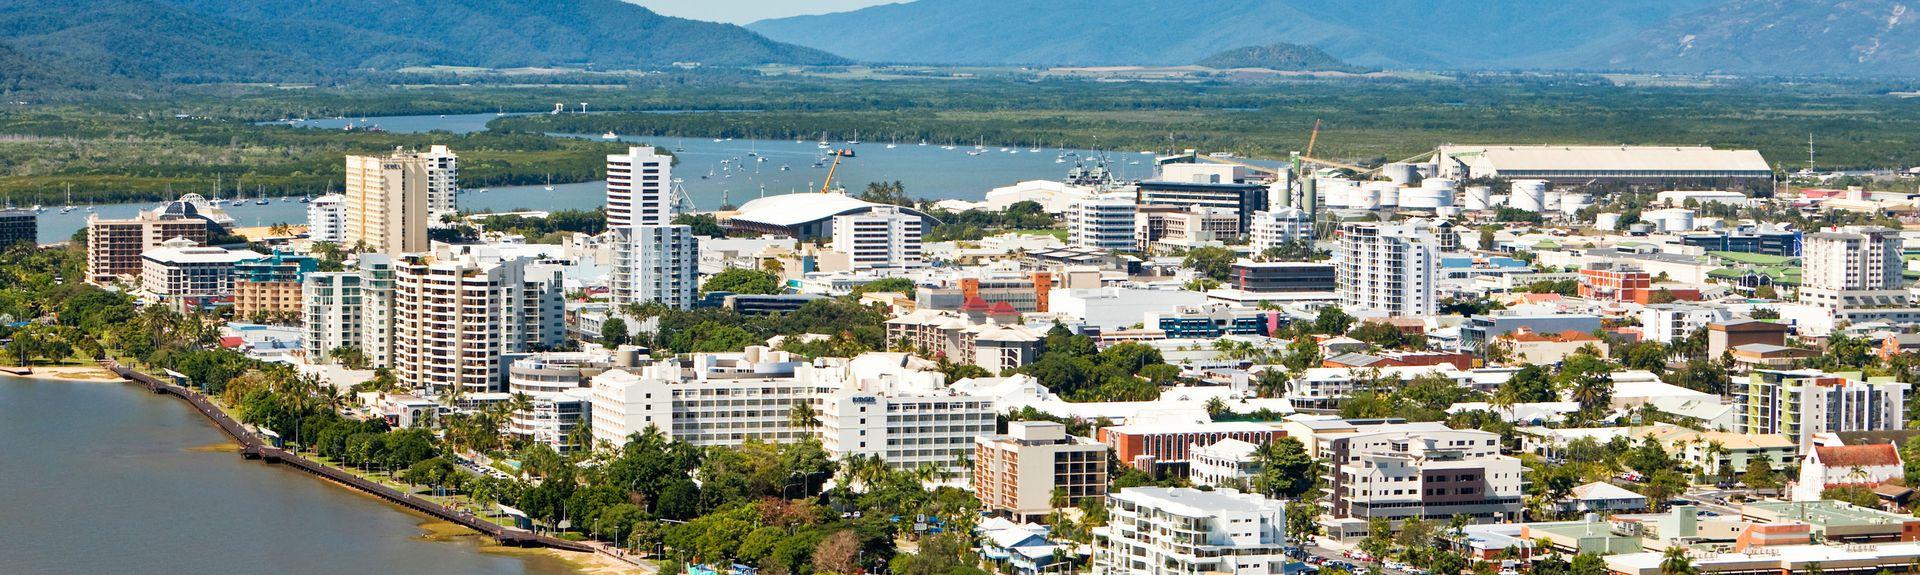 Cairns, Cairns, Queensland, Australien